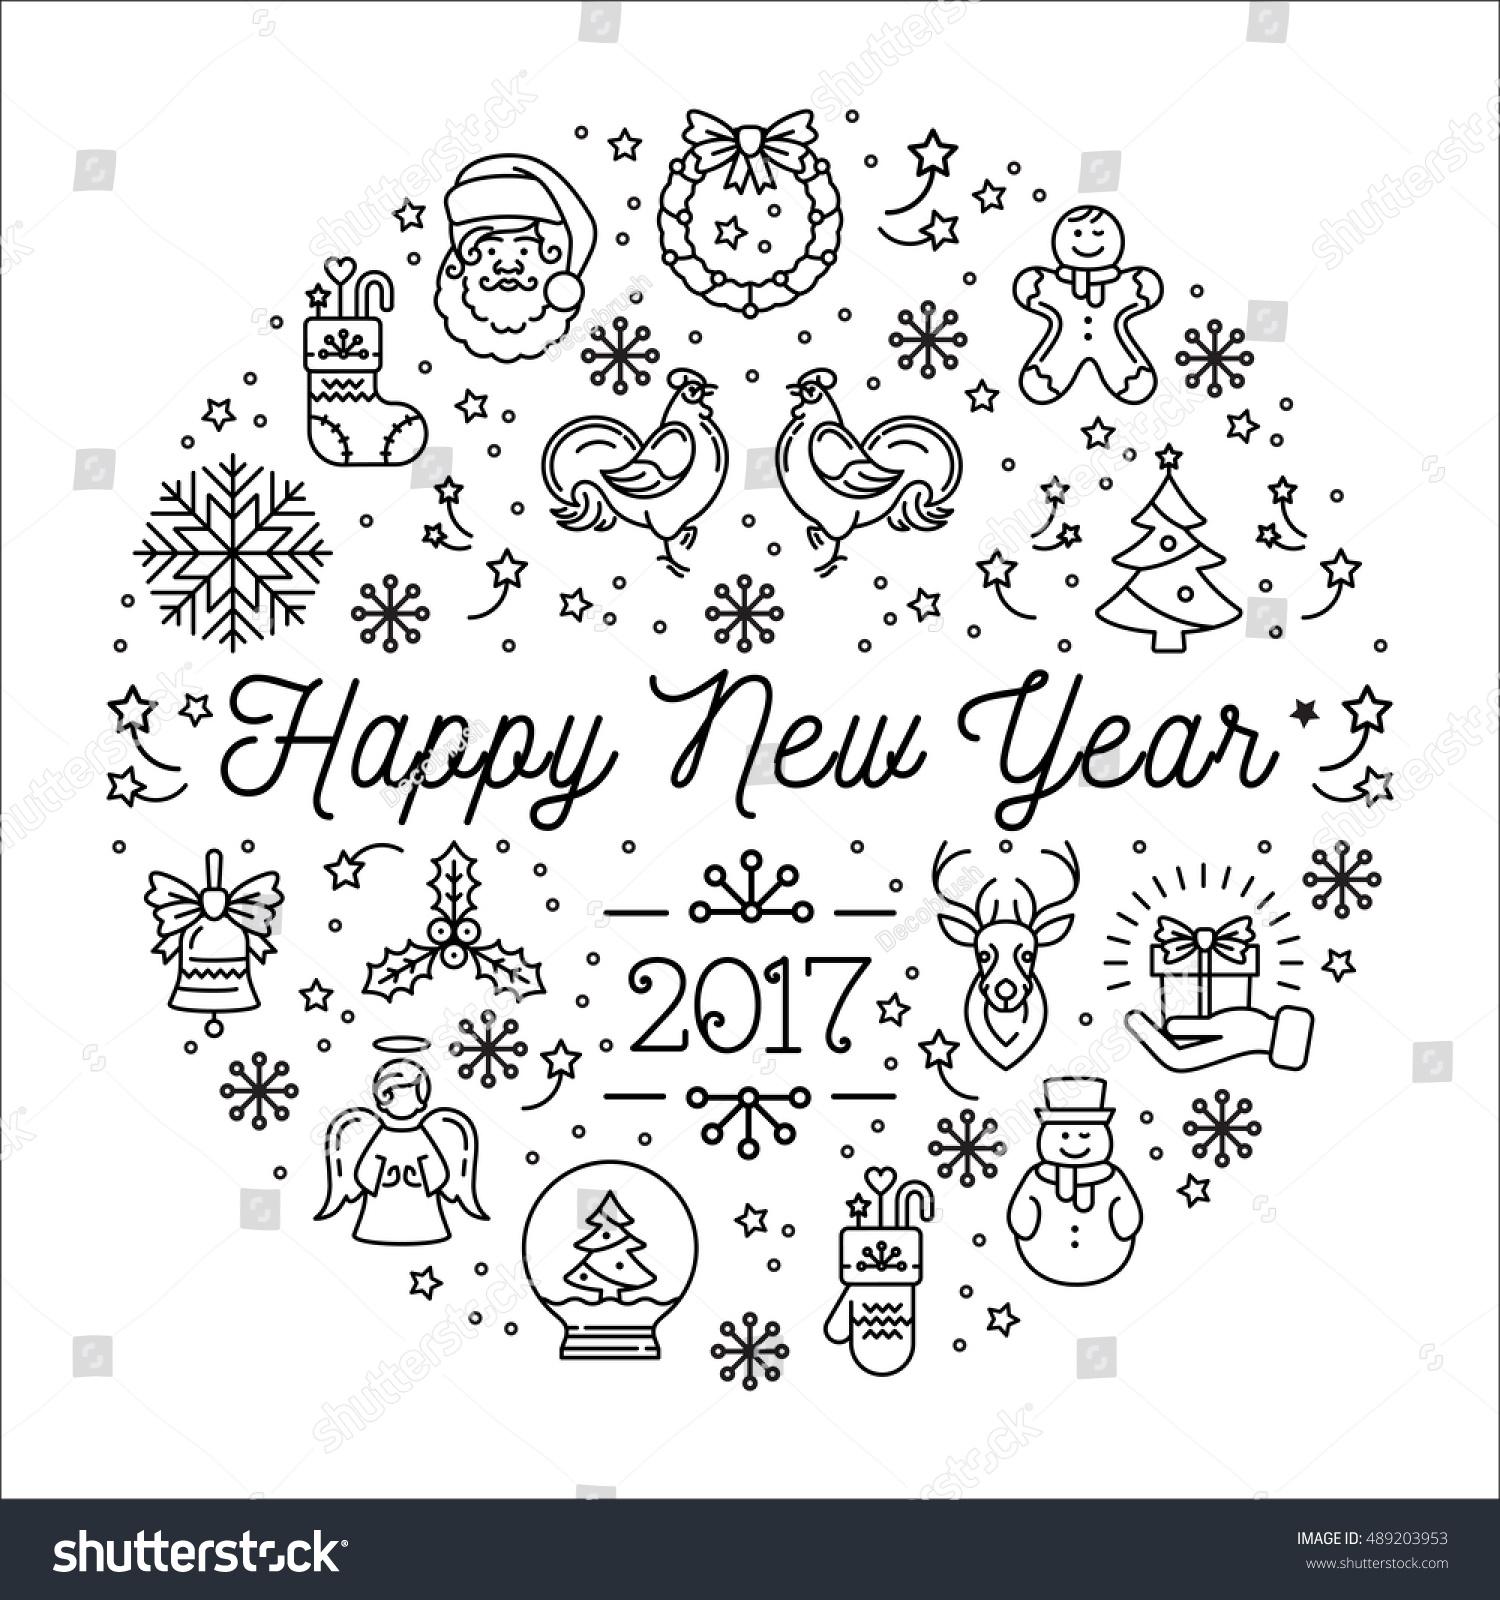 Line Art Design Trend : Happy new year design template stock vector